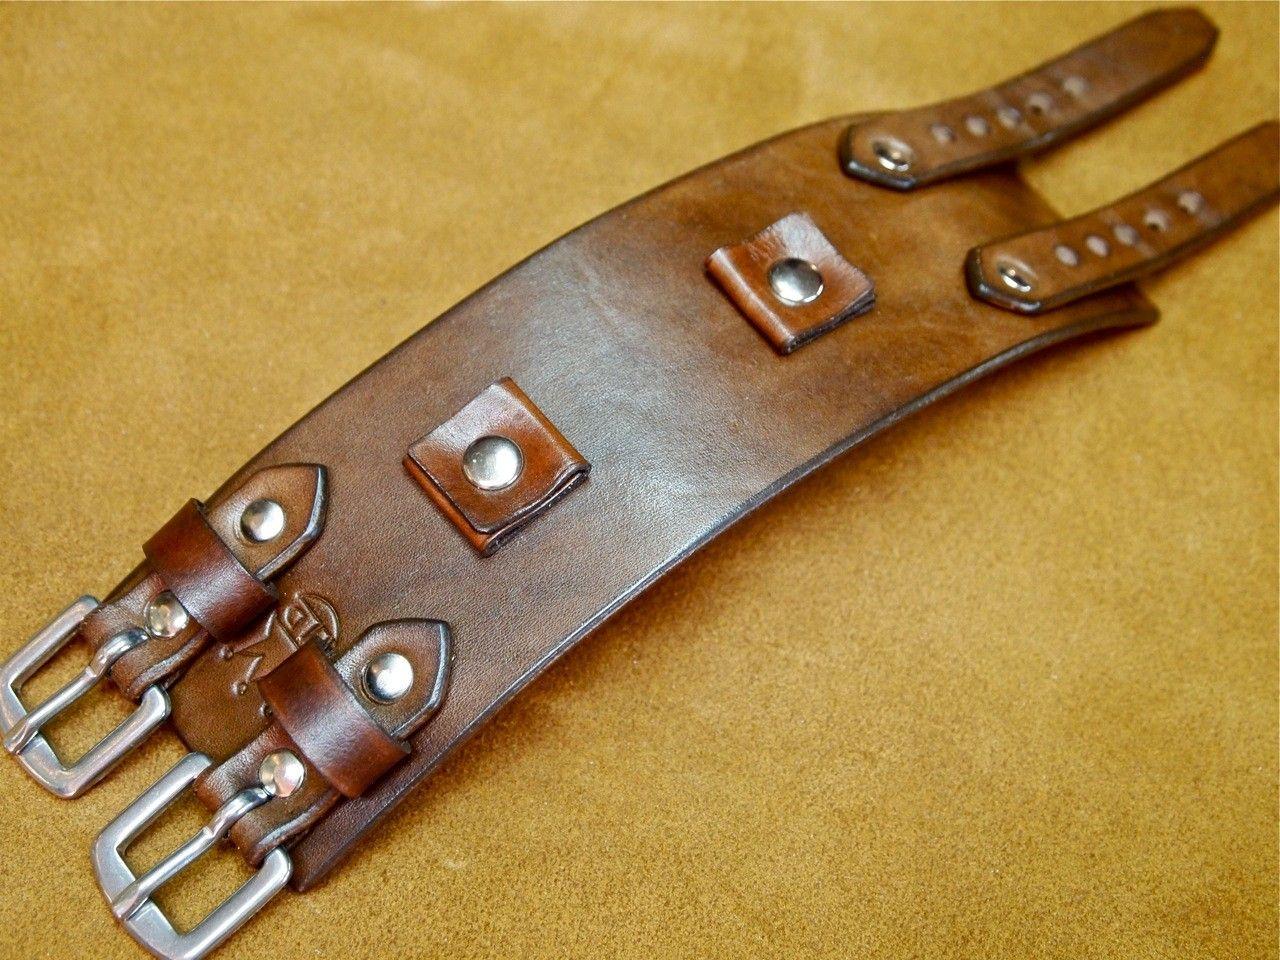 Google chrome themes johnny depp - Leather Cuff Bracelet Brown Johnny Depp Vintage By Mataradesign